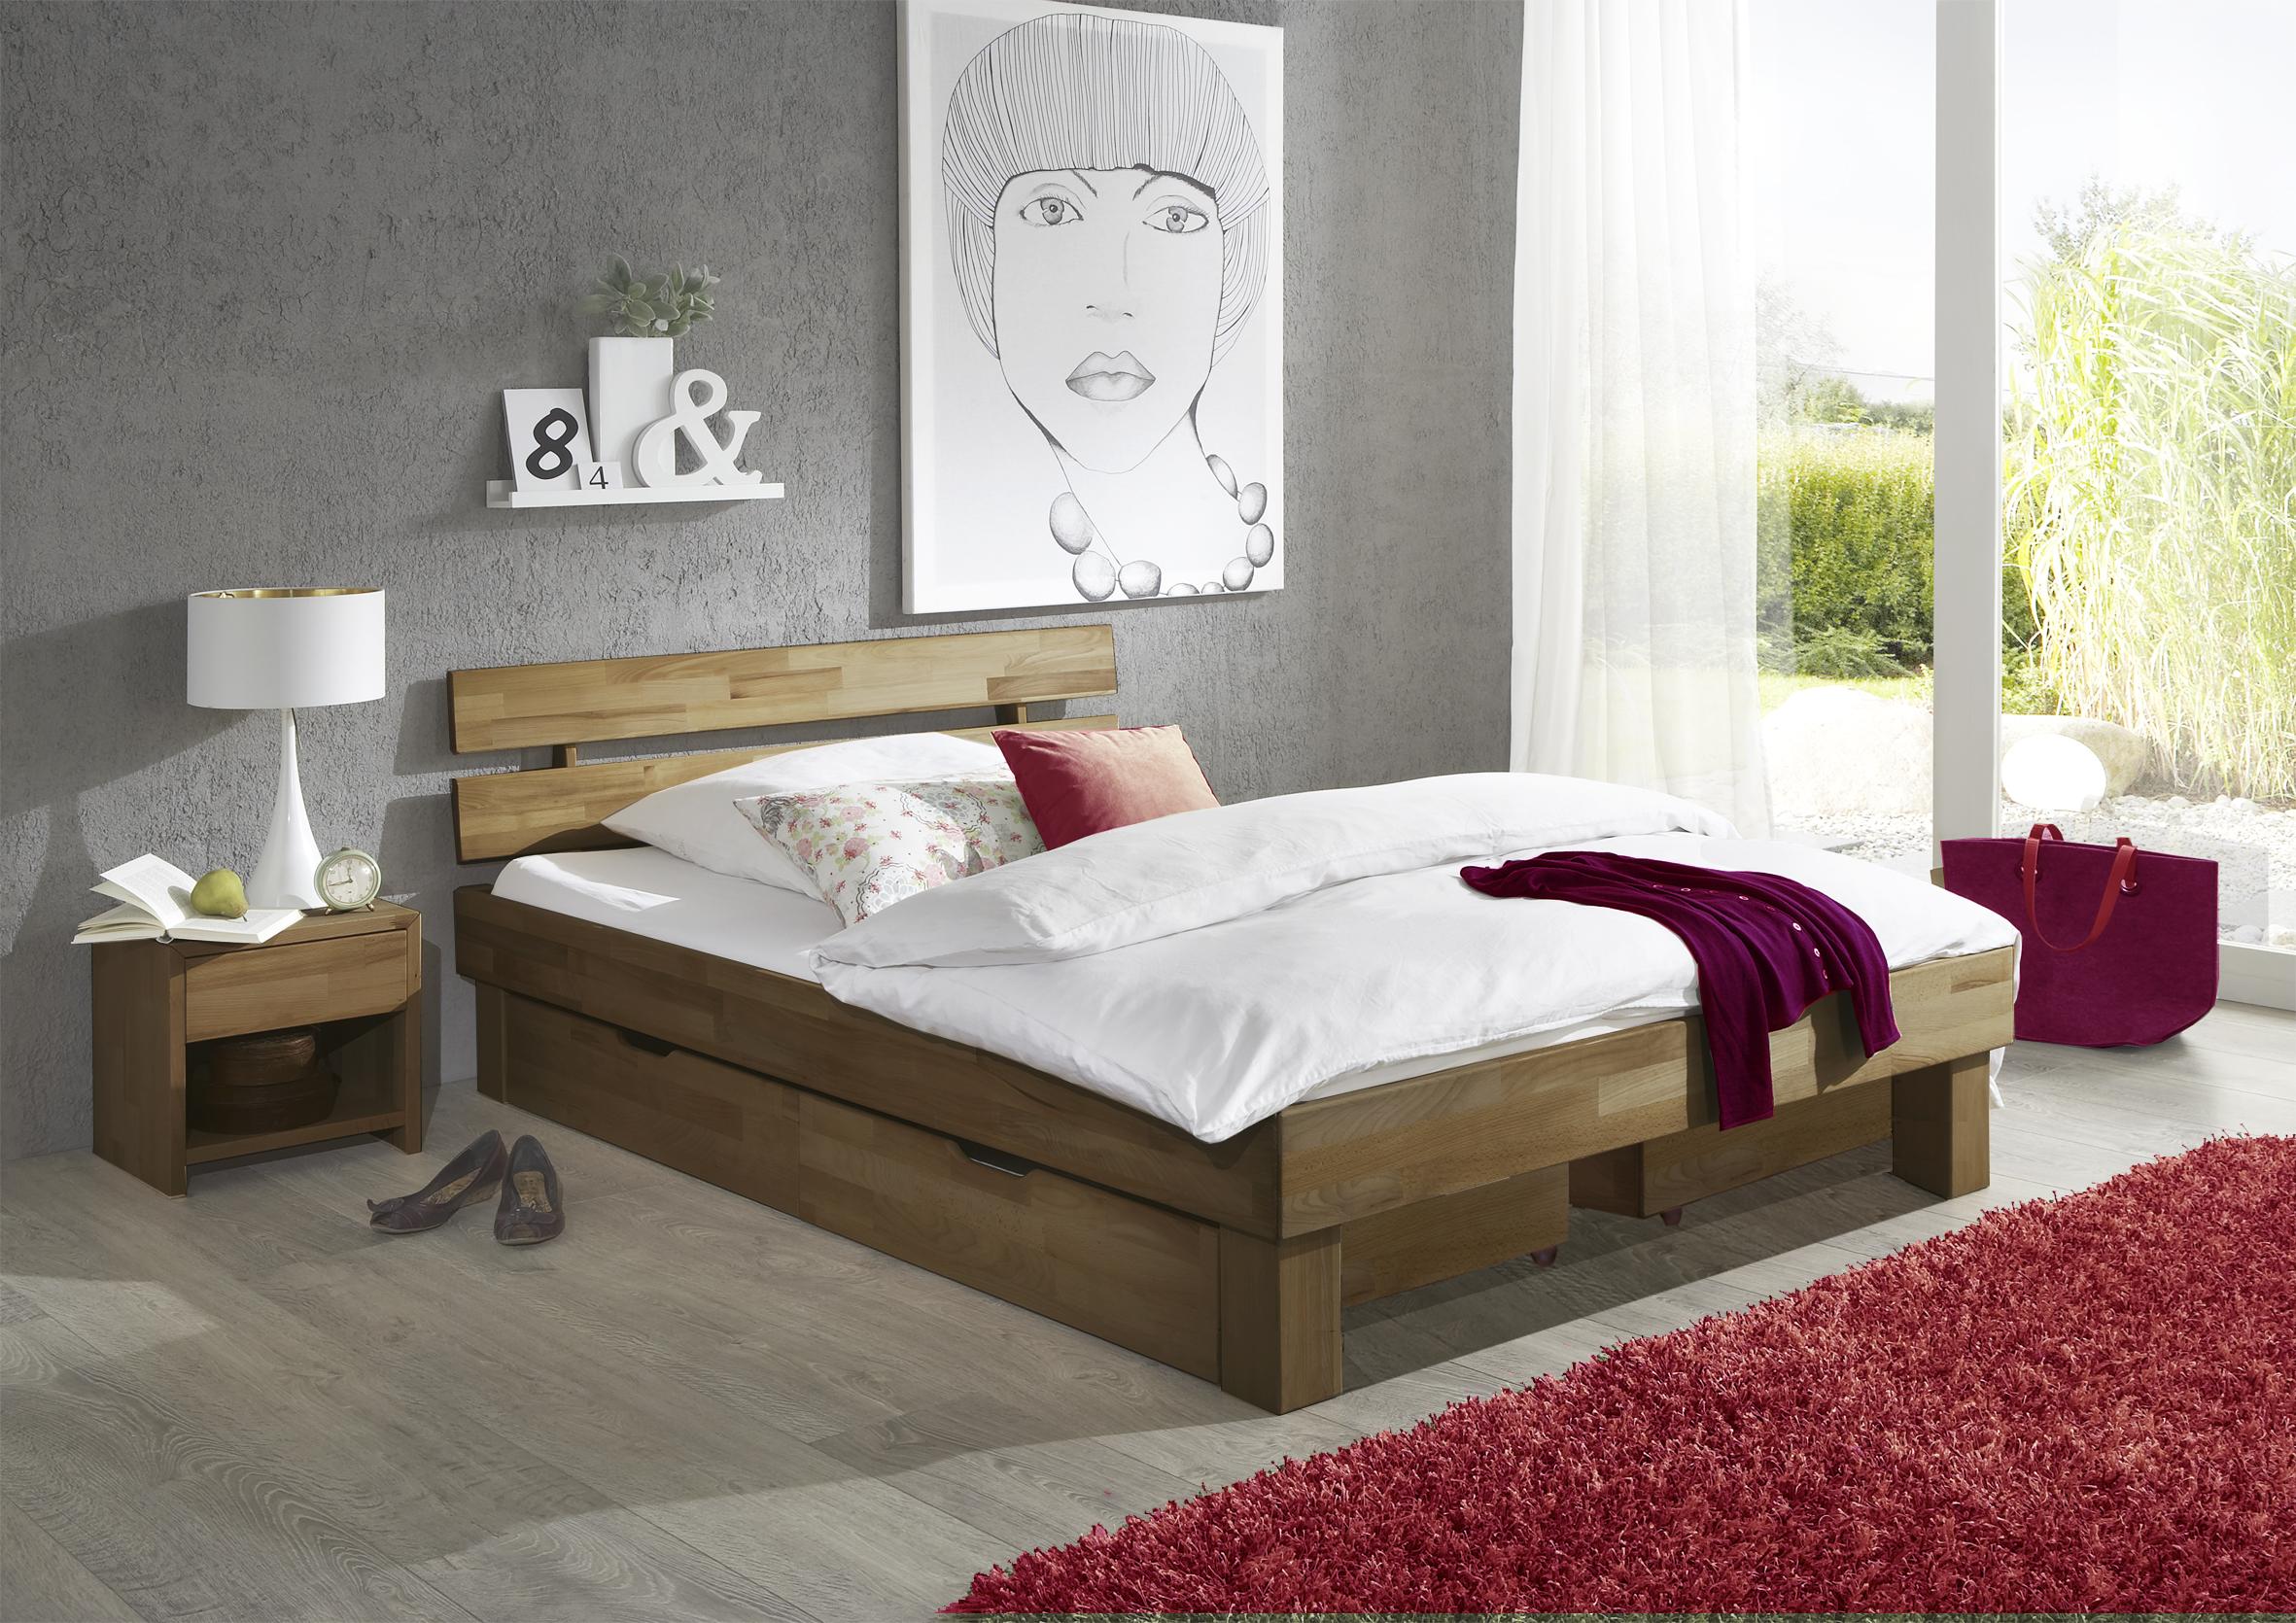 100x200 Bett Futonbett Holzbett Mit Bettkasten Wildeiche Massiv Jen100ebk Geölt